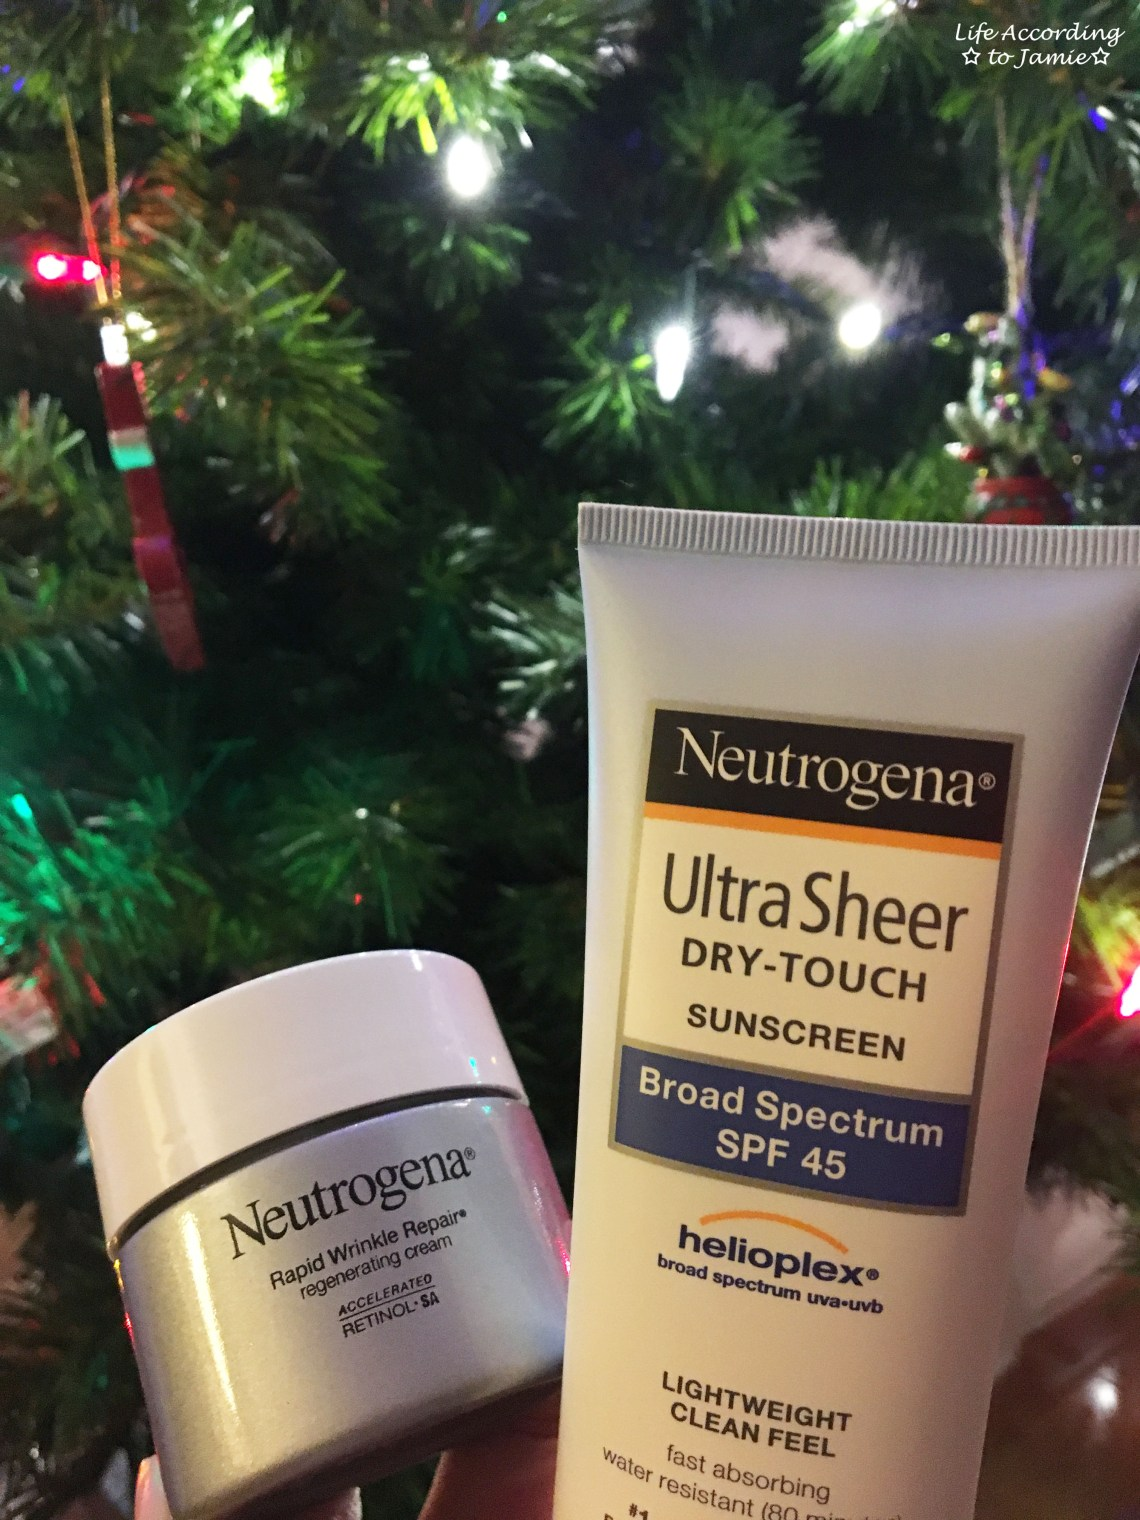 Neutrogena - Rapid Wrinkle Repair + Ultra Sheer Dry Touch Sunscreen